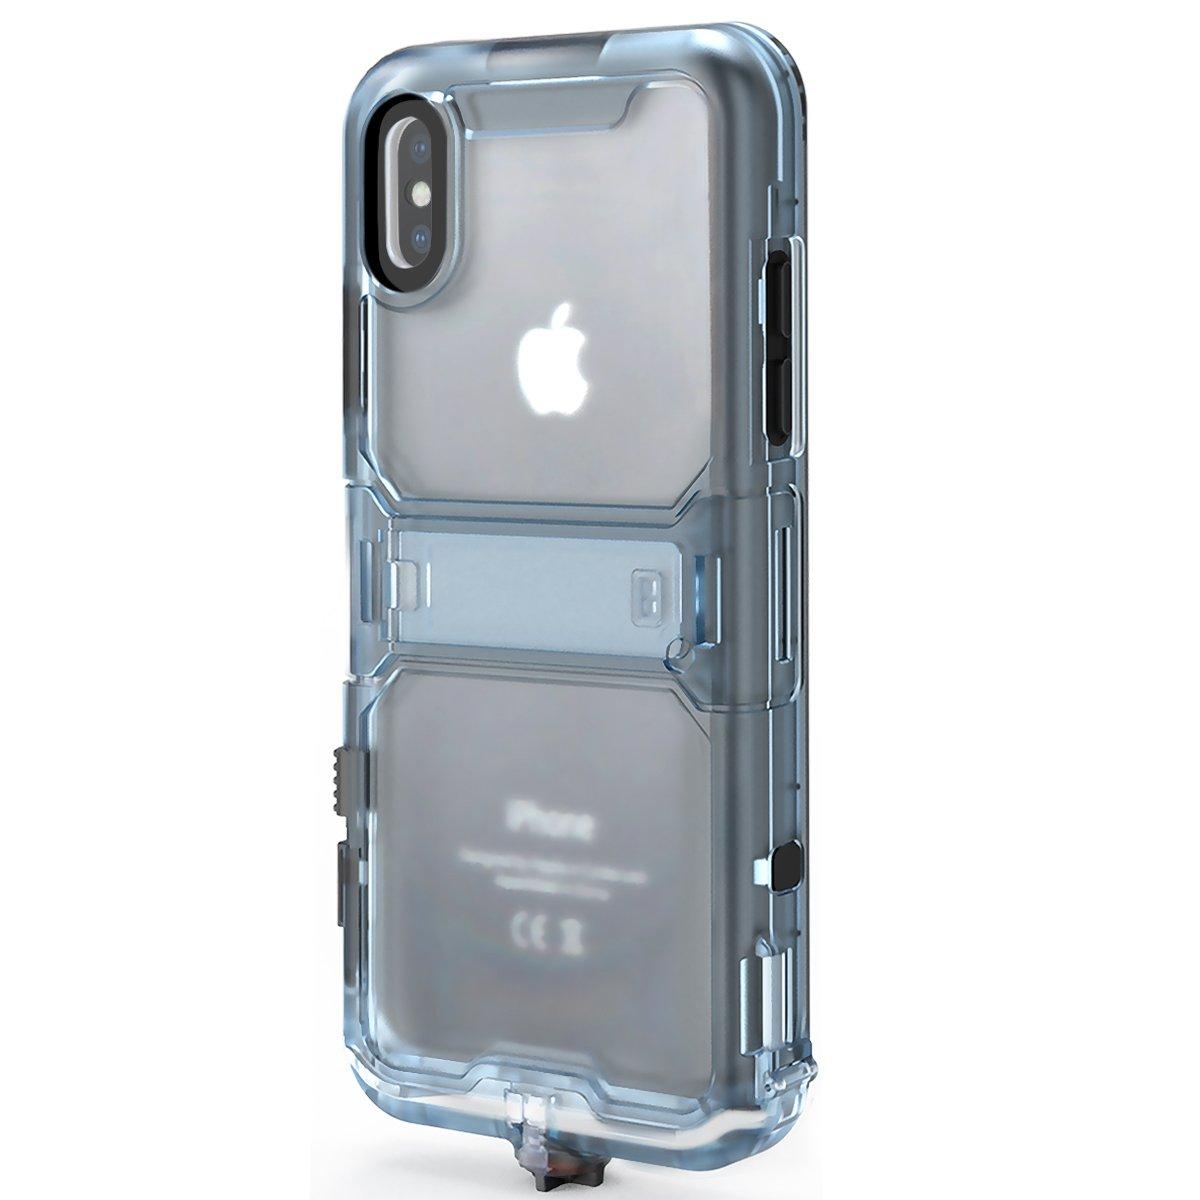 Cornmi iPhone X Waterproof Case, Full Sealed IP68 Certified Waterproof Shockproof Snowproof Protection Underwater Case for iPhone X 5.2inch (Black) by Cornmi (Image #10)